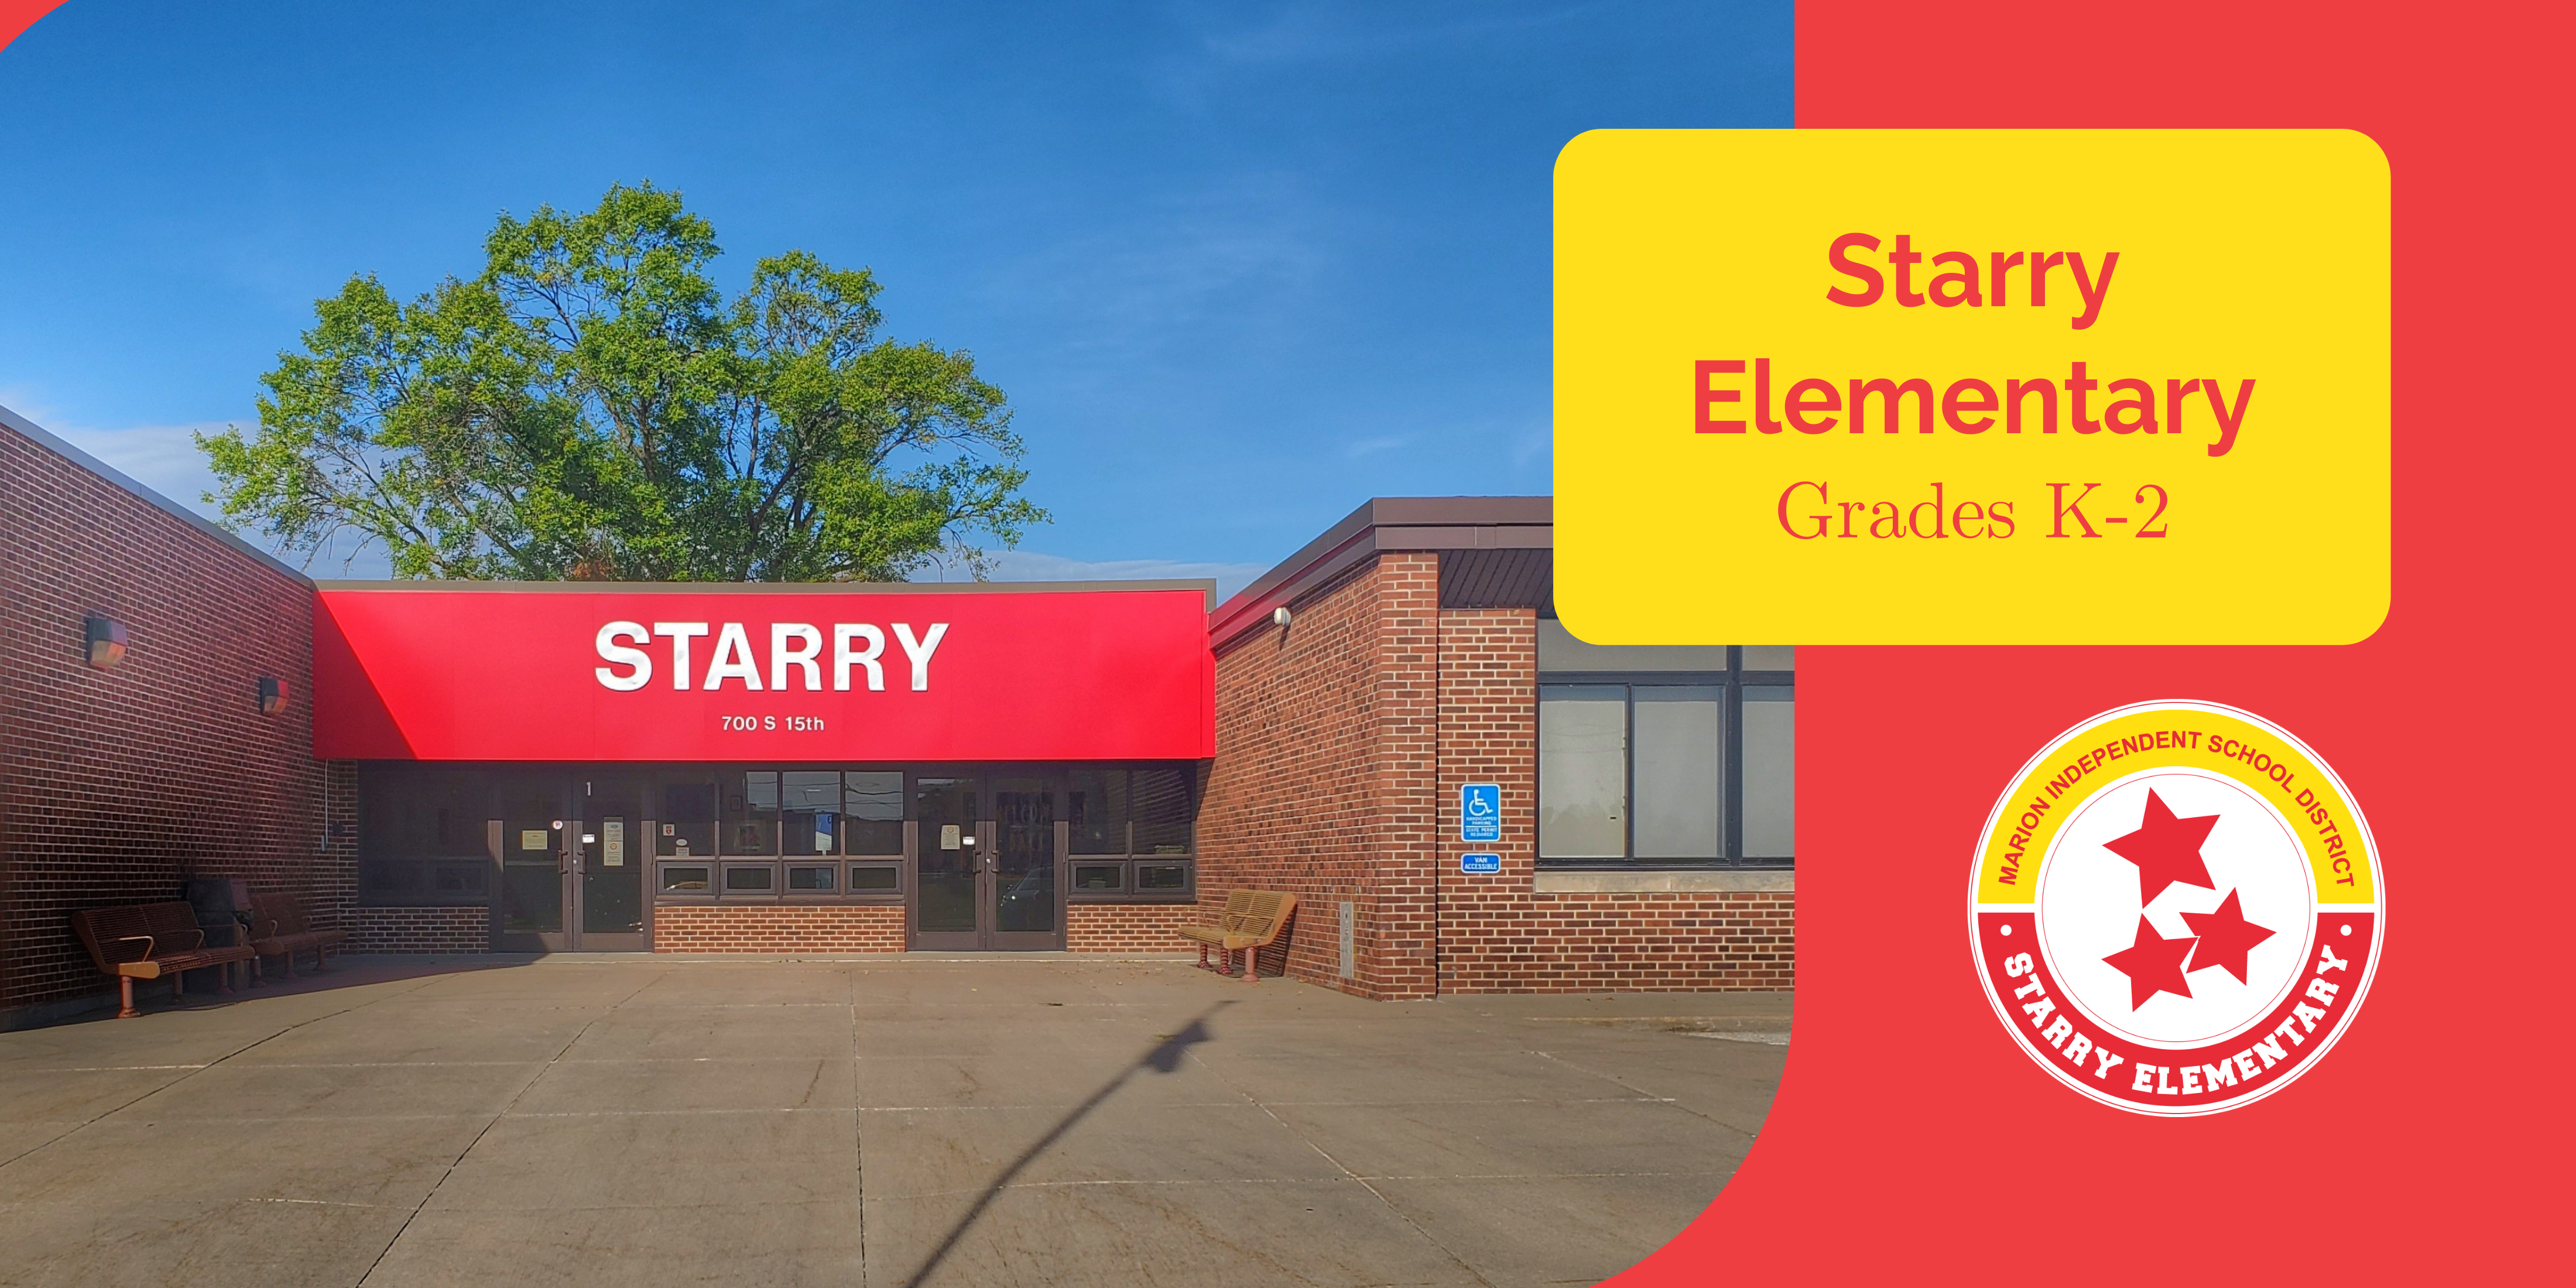 Starry Elementary